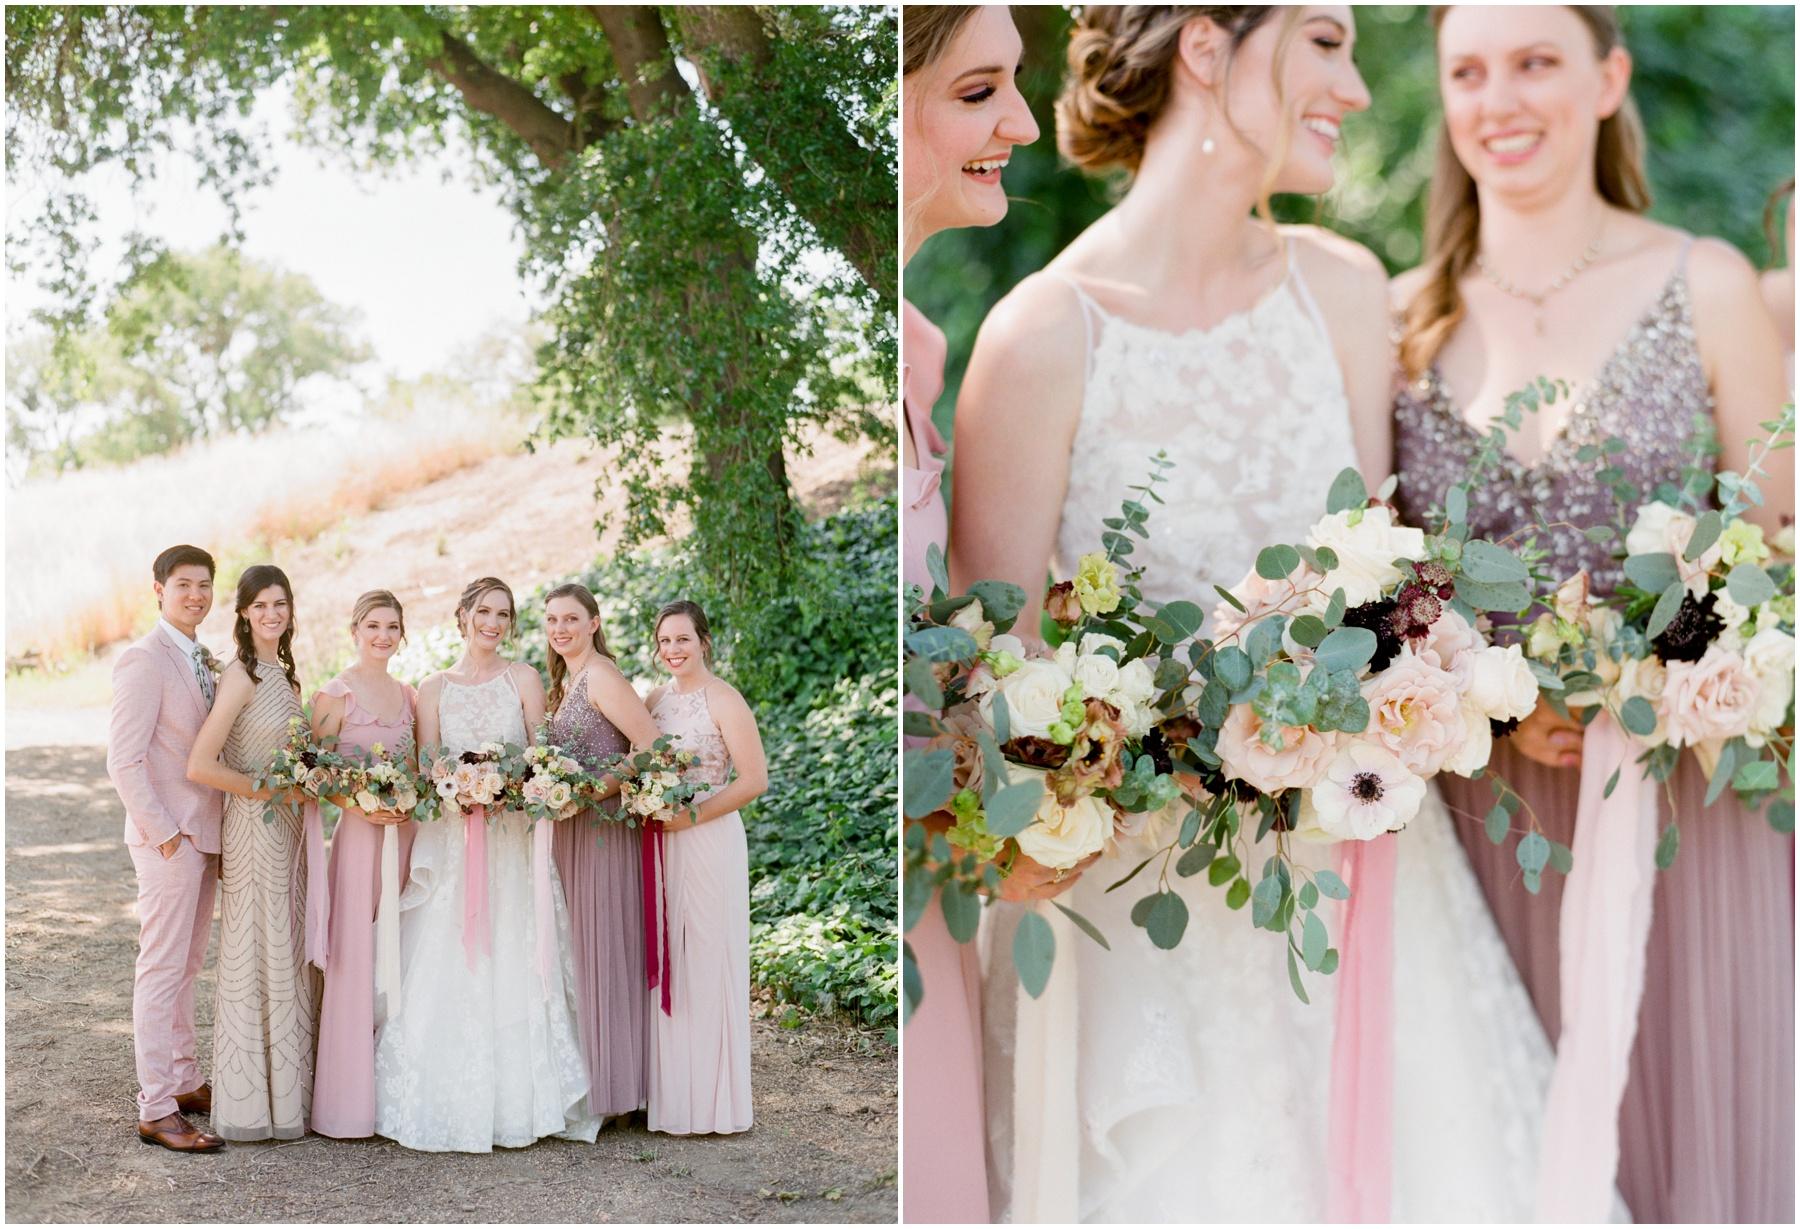 Scribner-bend-vineyards-wedding-sacramento-california-Kristine-Herman-Photography-14.jpg